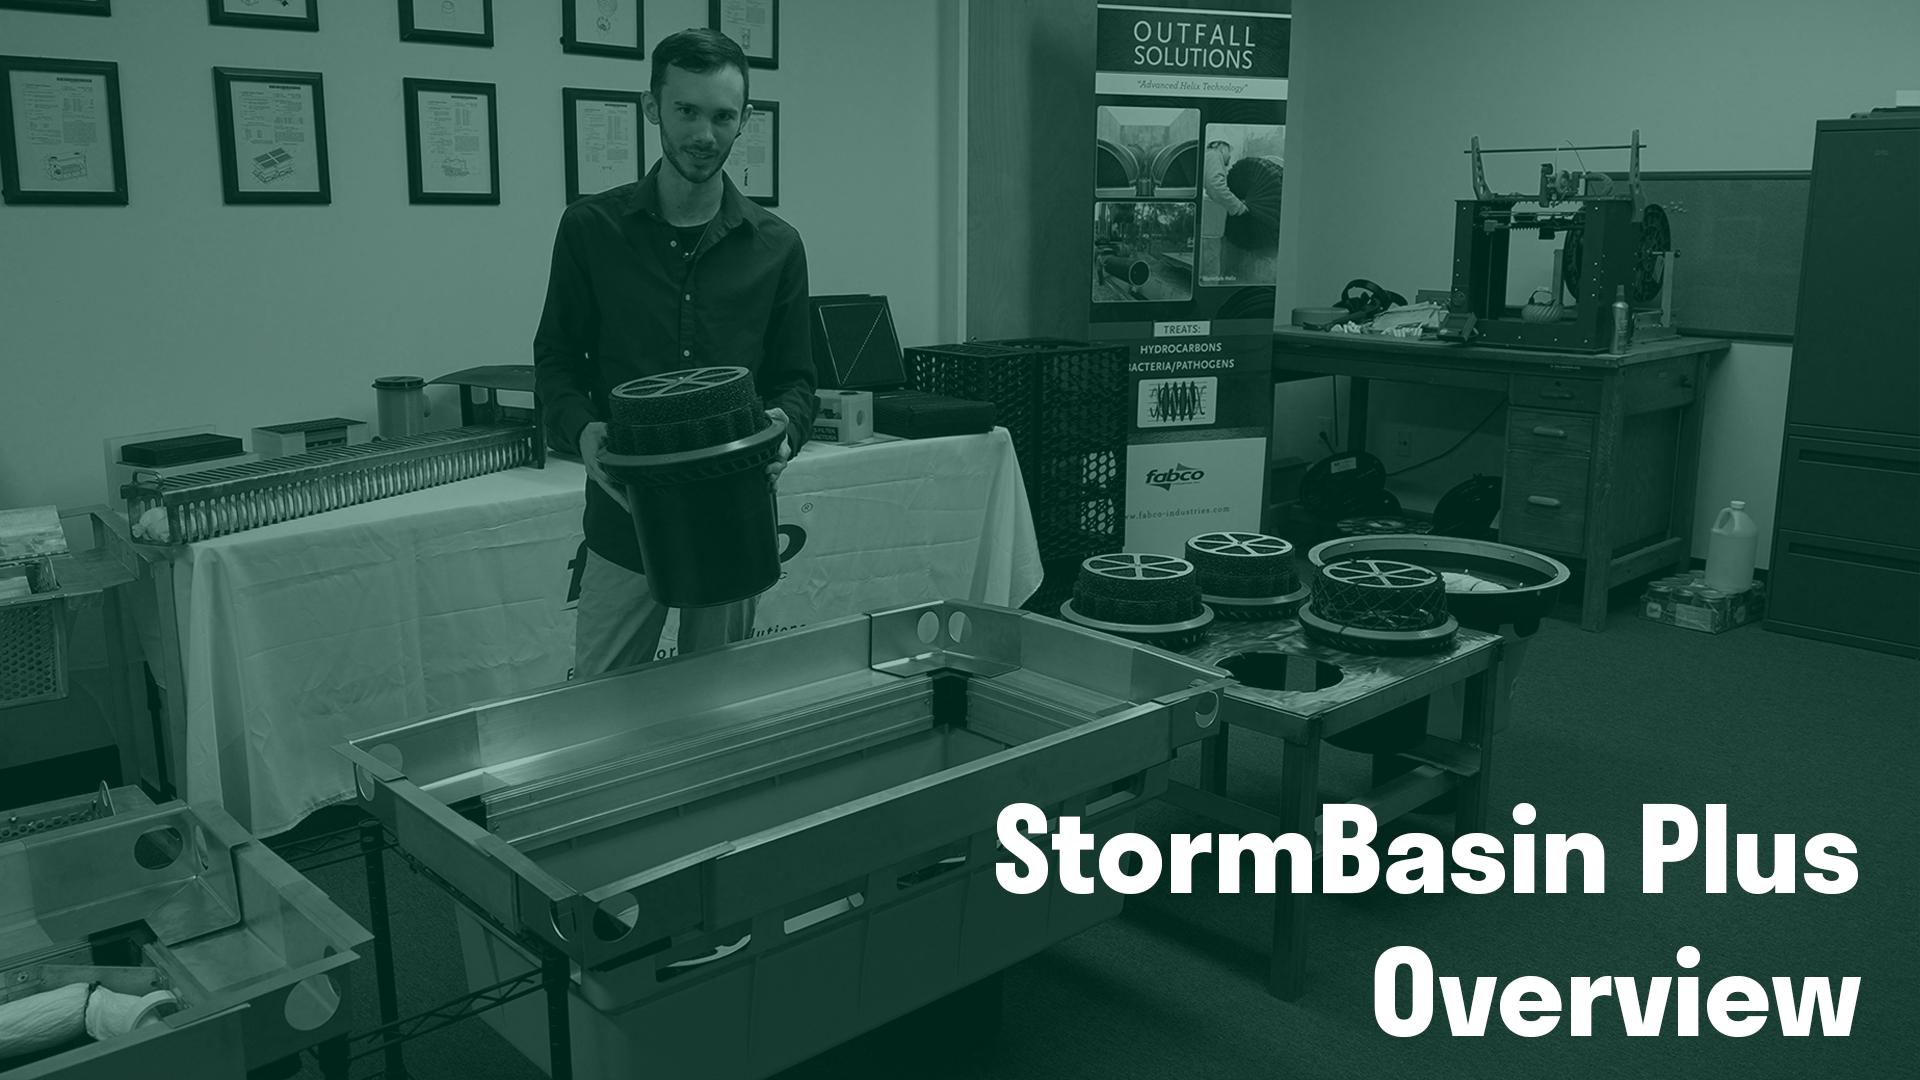 StormBasin Plus Overview